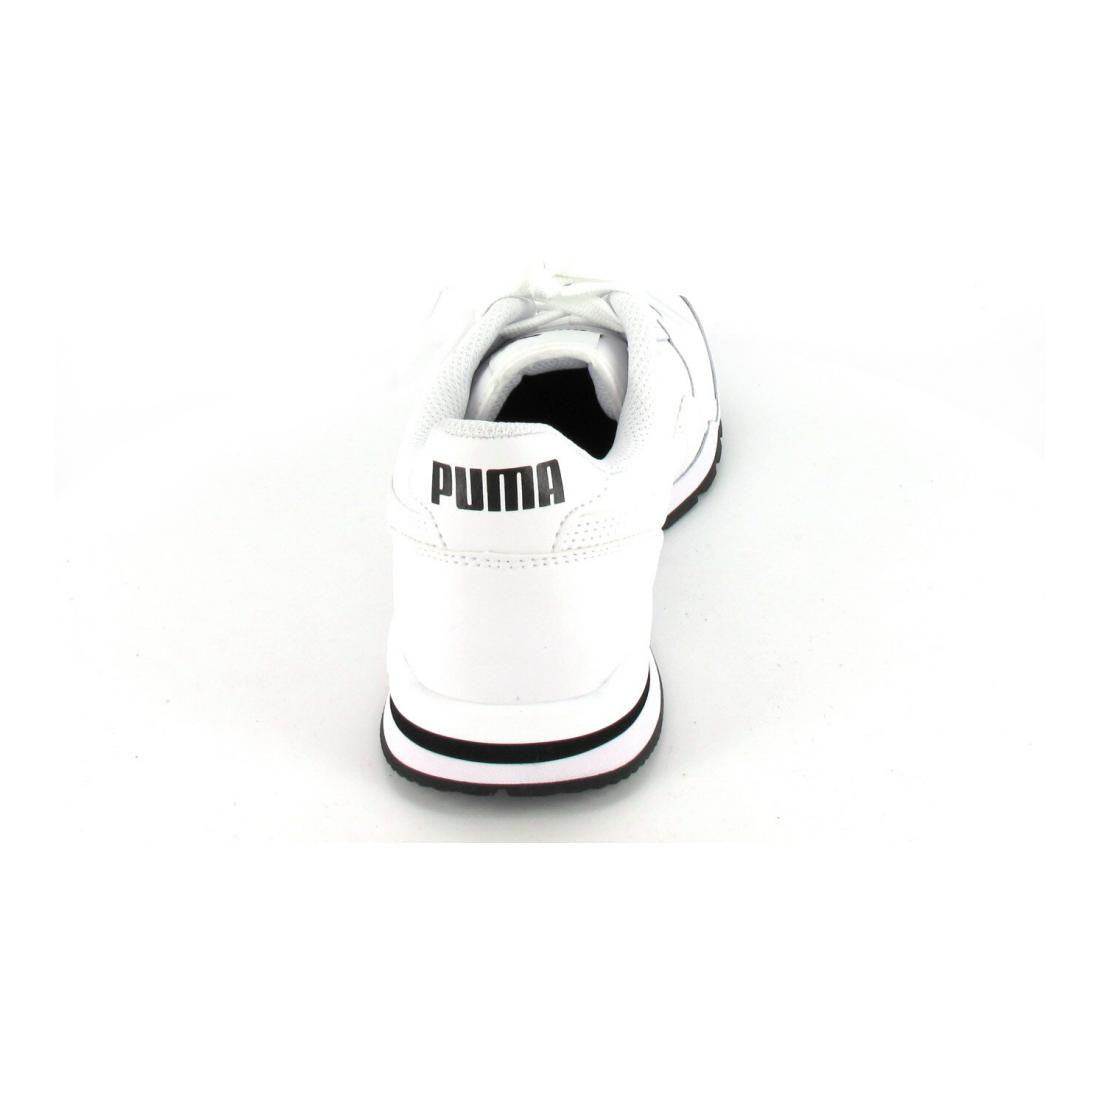 adidas bball80s sneaker weiß blau rot